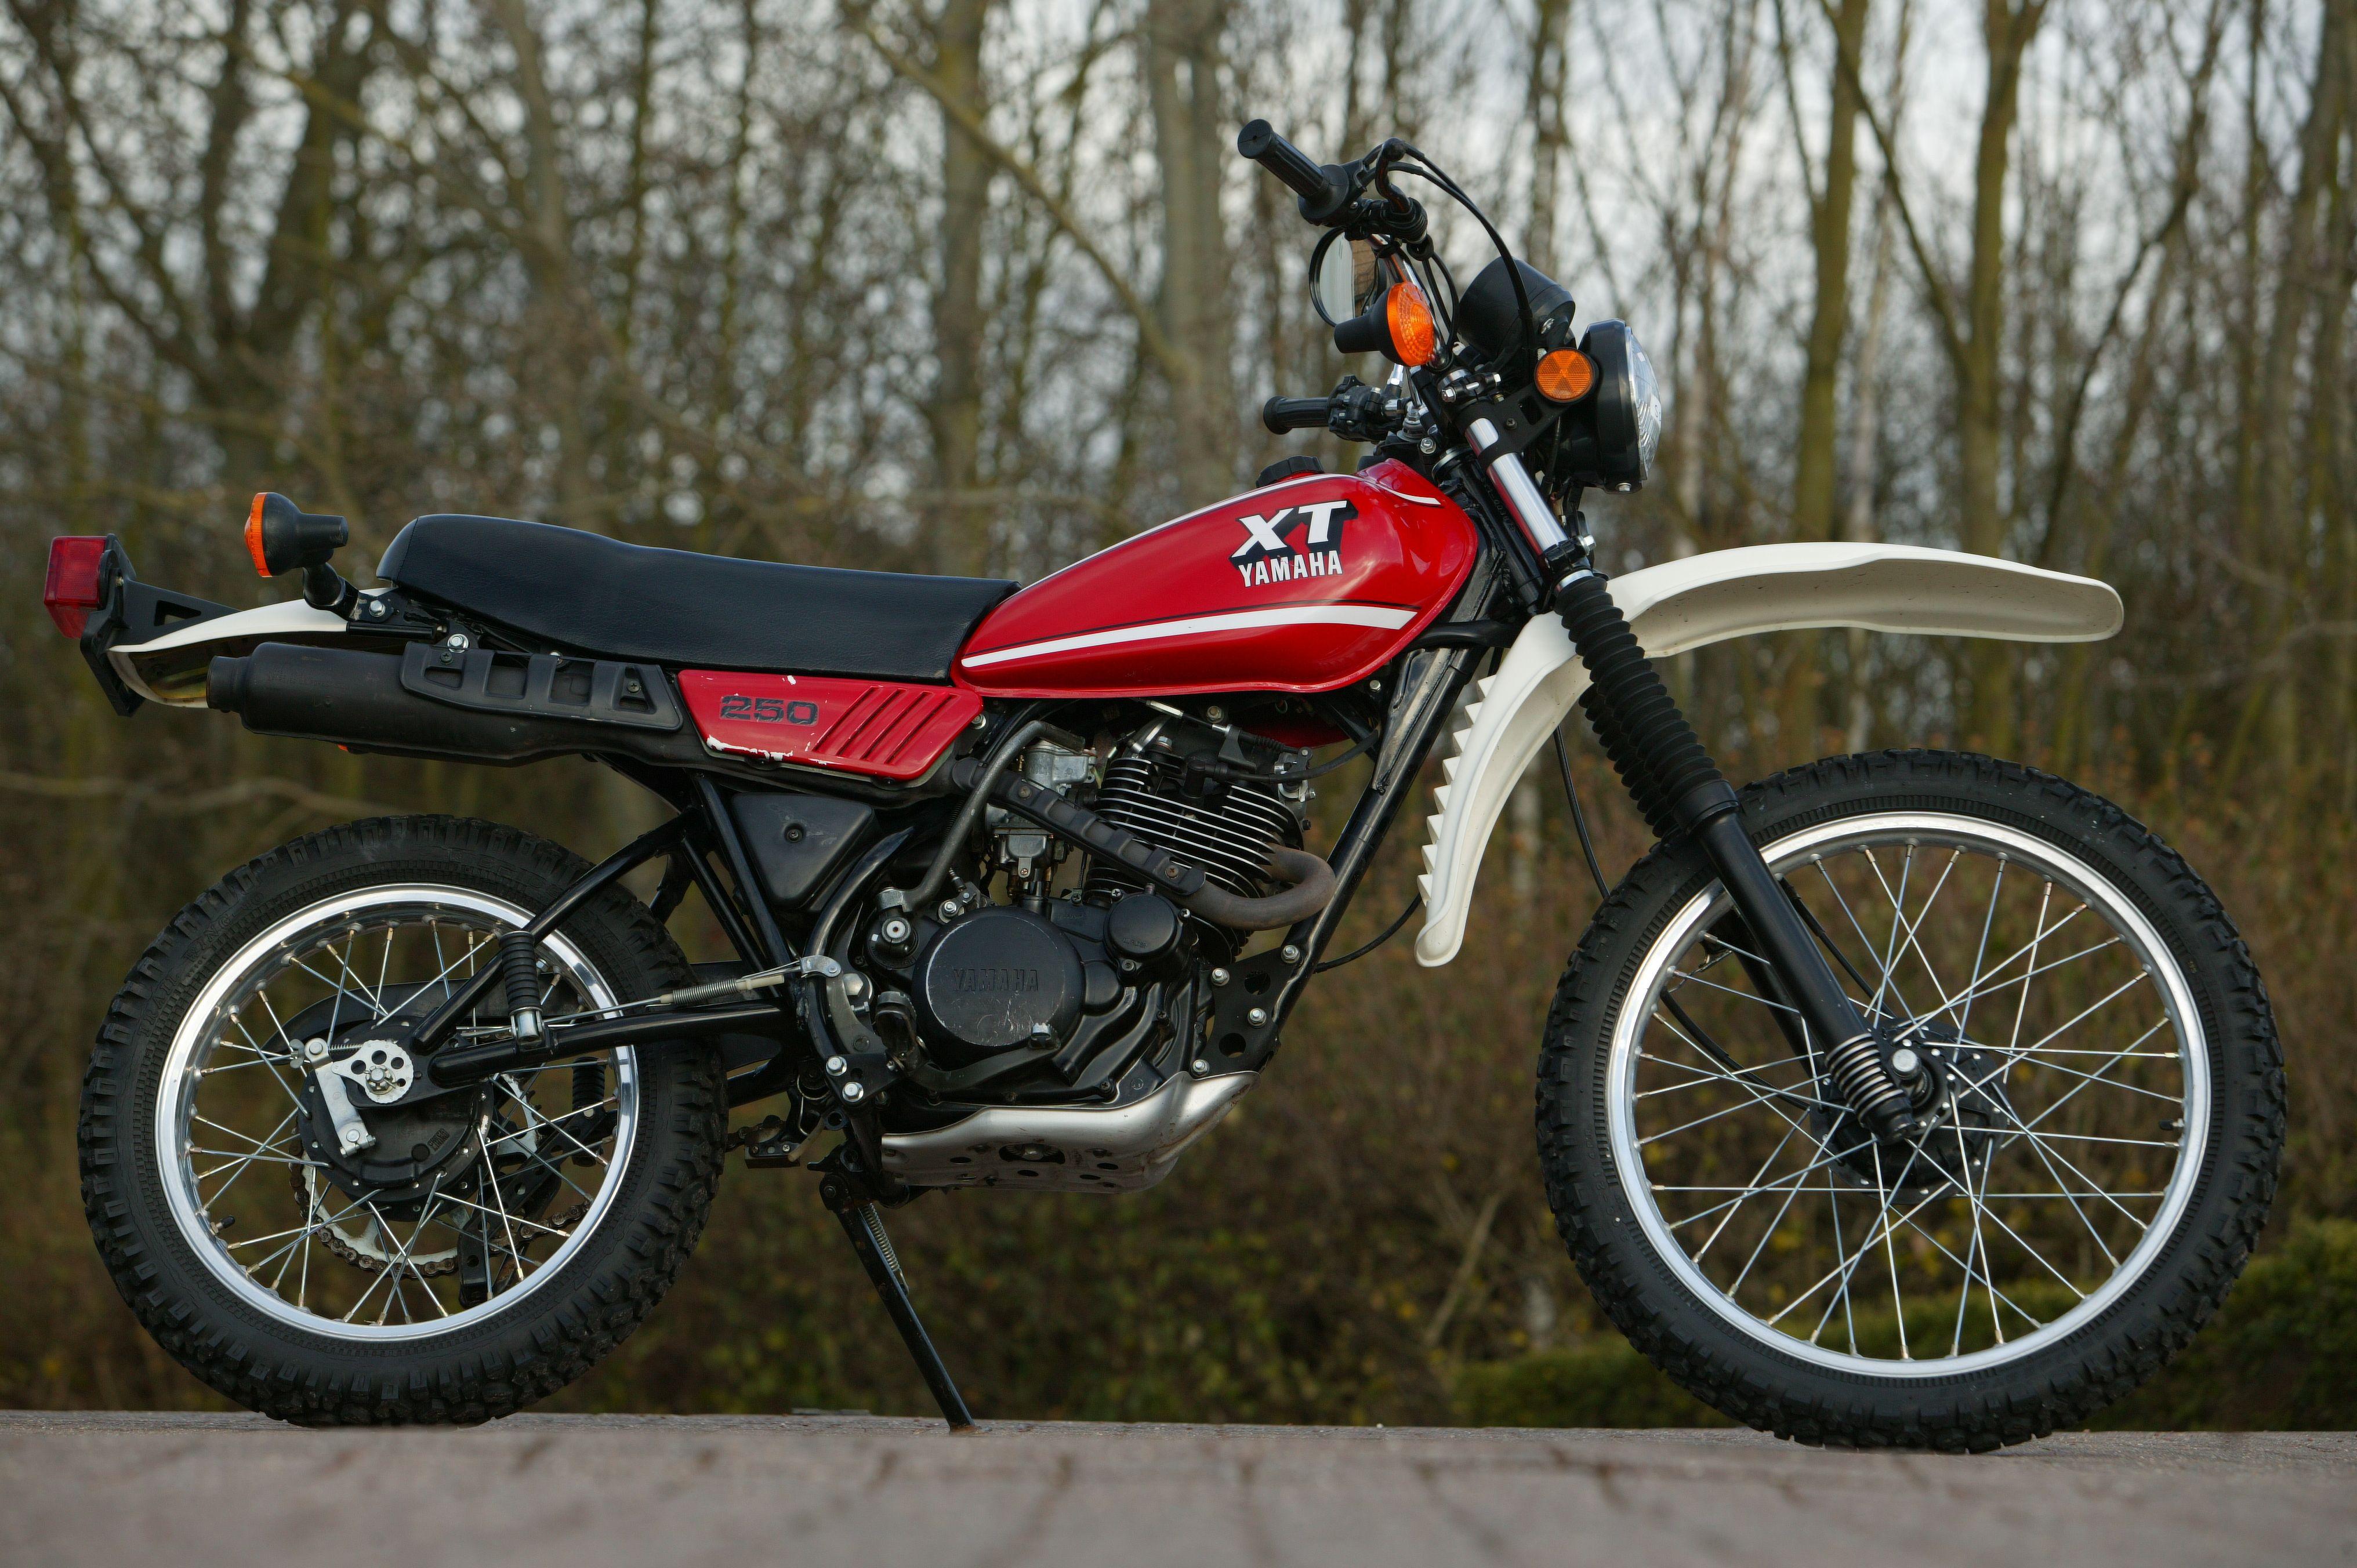 Yamaha Xt250 Yamaha Classic Bikes Yamaha Motorcycles Sports